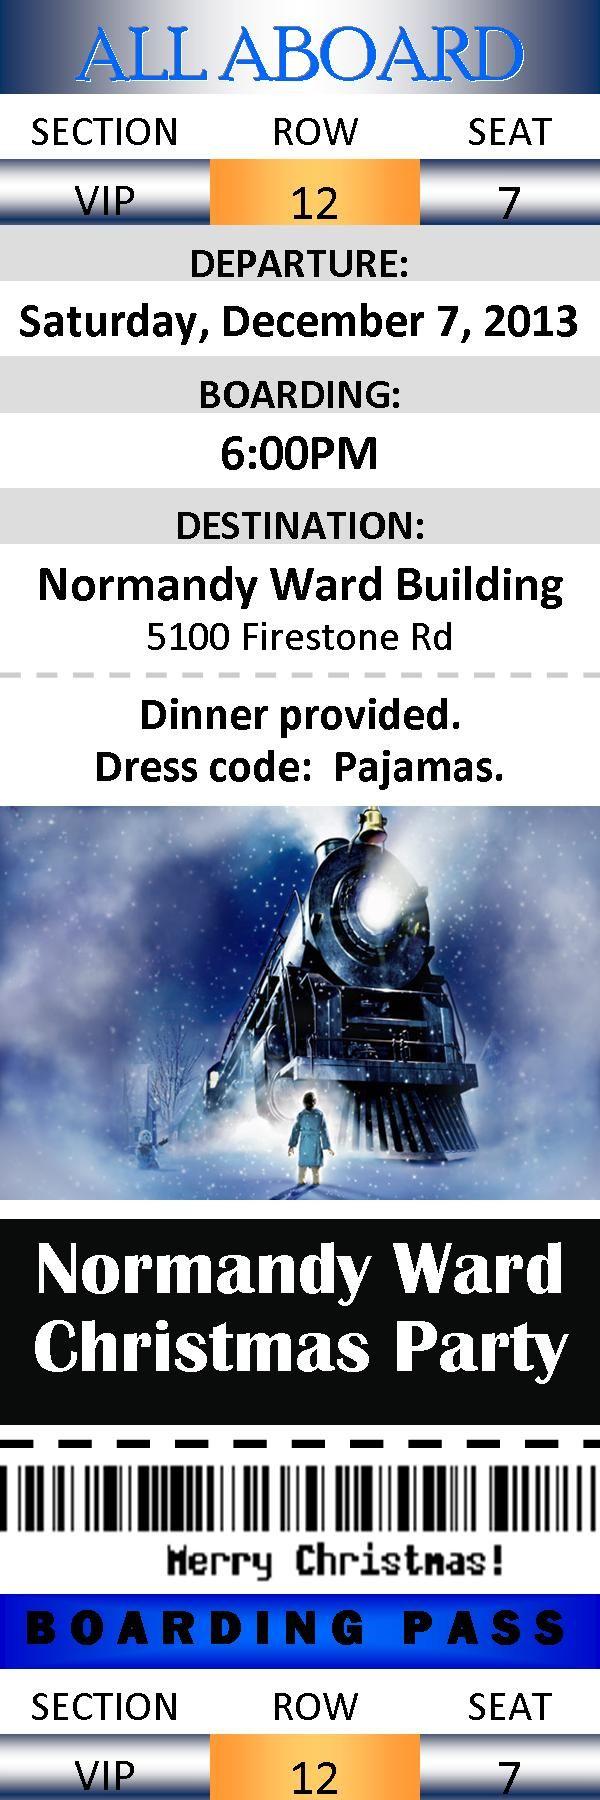 Polar Express Ward Christmas Party tickets